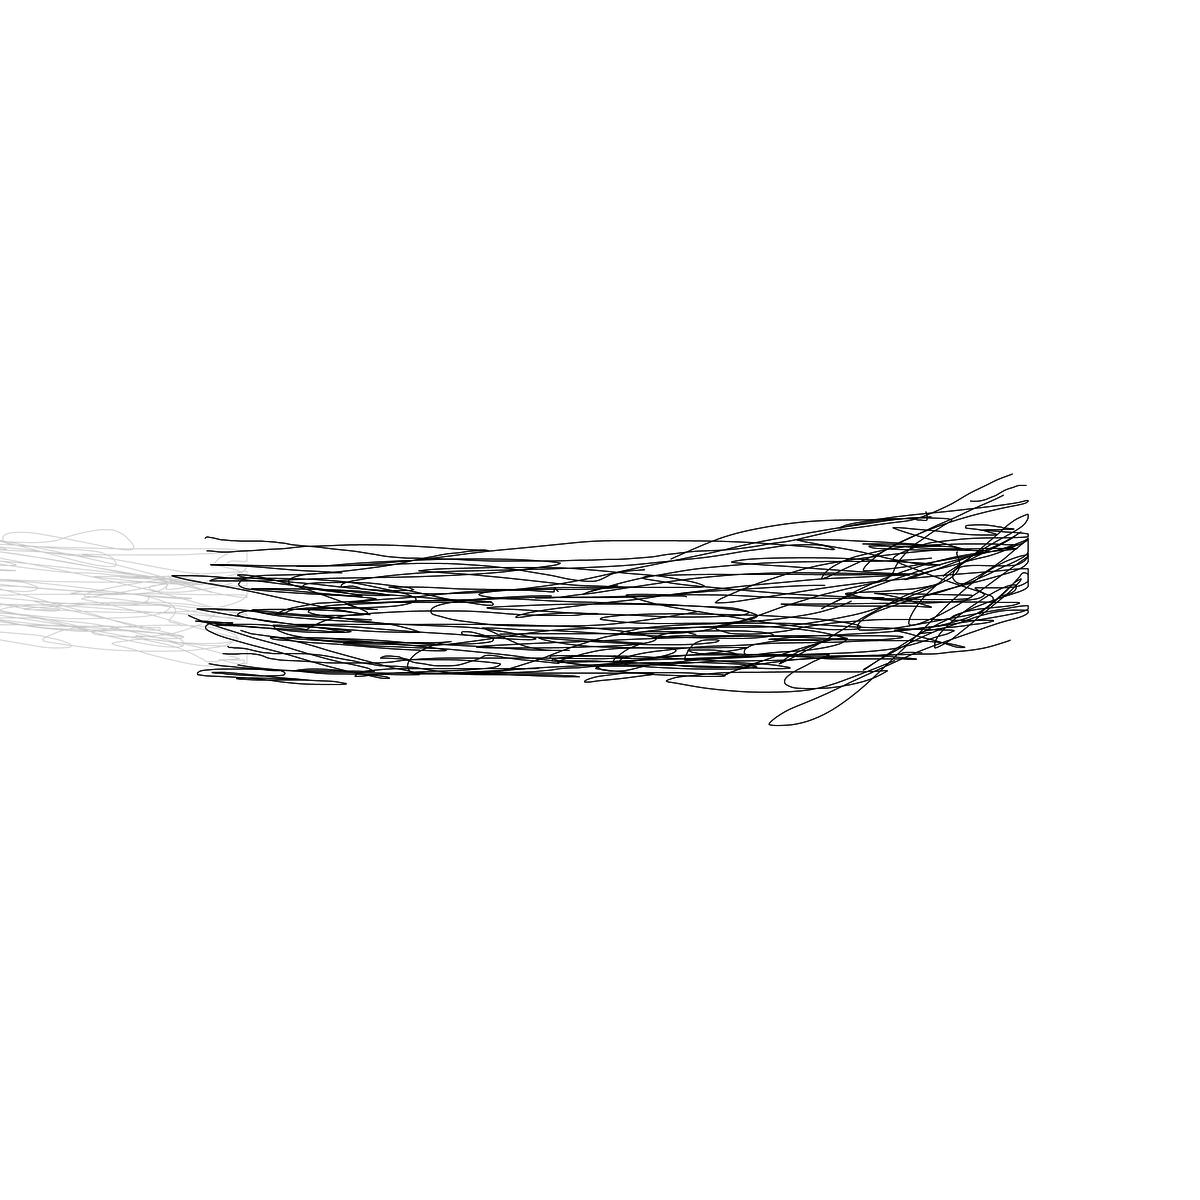 BAAAM drawing#6127 lat:51.3320693969726560lng: 12.3619947433471680